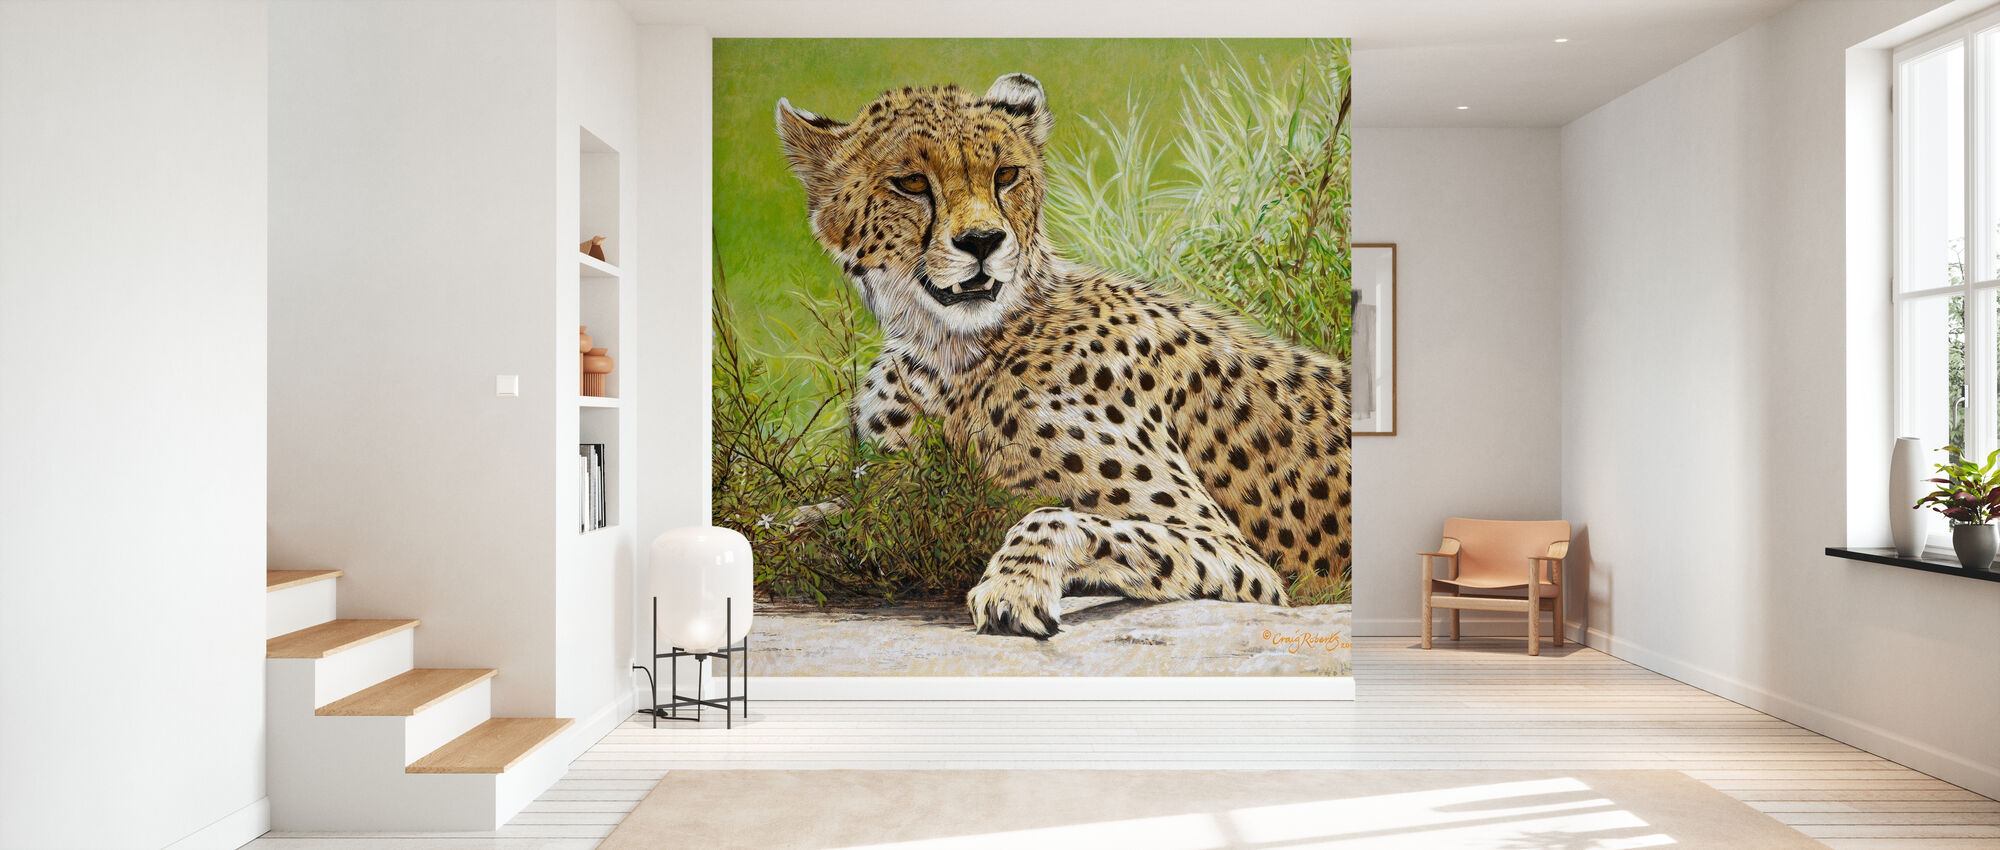 Restful Hunter - Wallpaper - Hallway